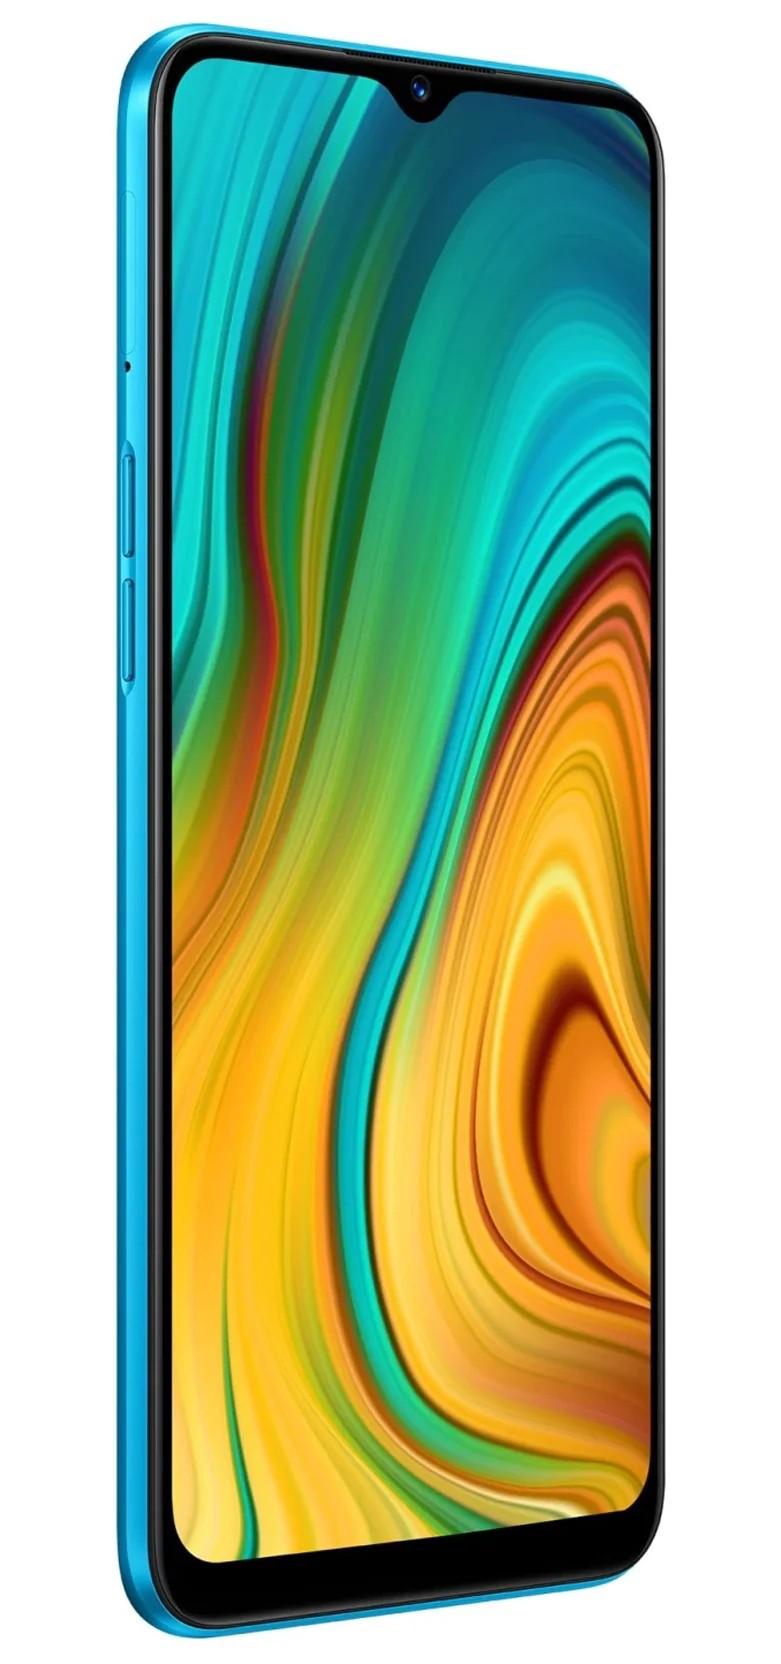 Realme C3 3/32Gb BLUE - 3